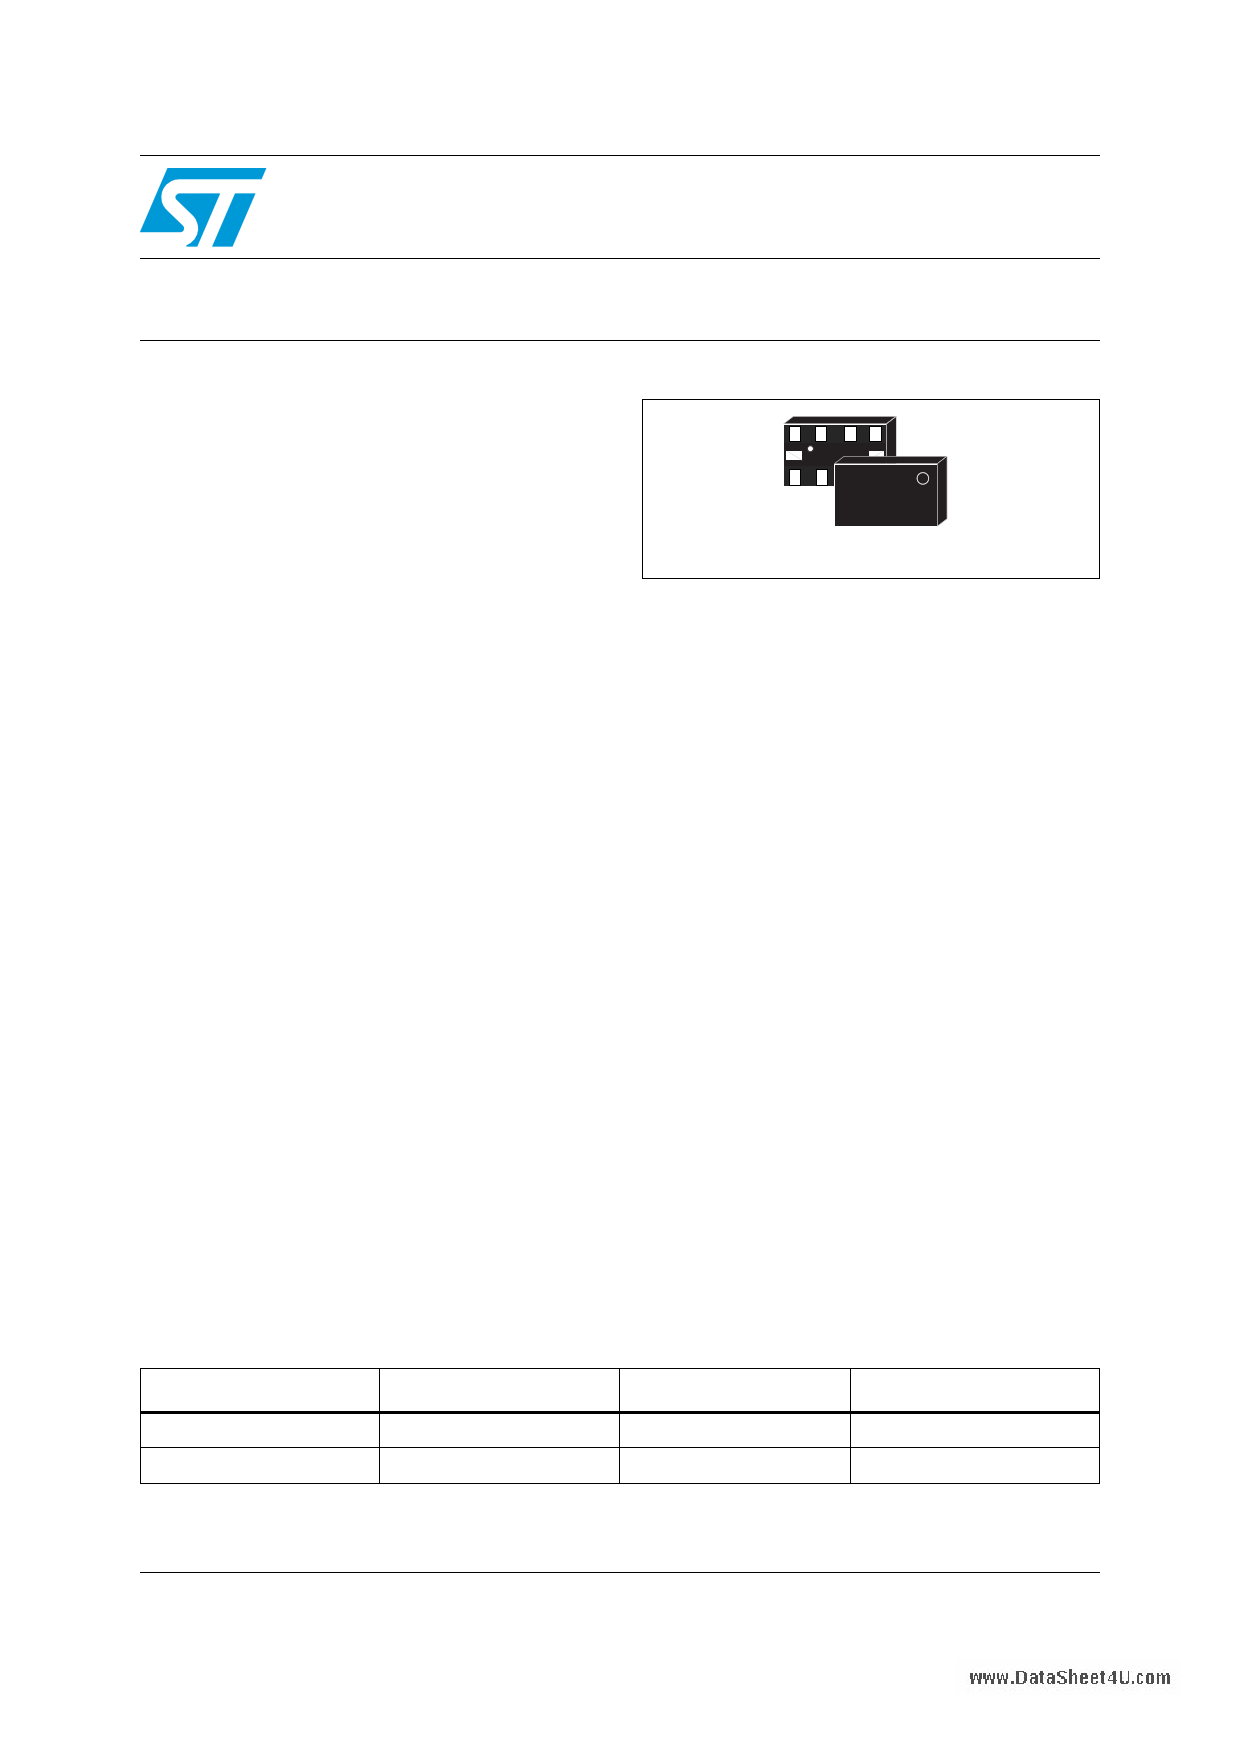 LY3100ALH دیتاشیت PDF